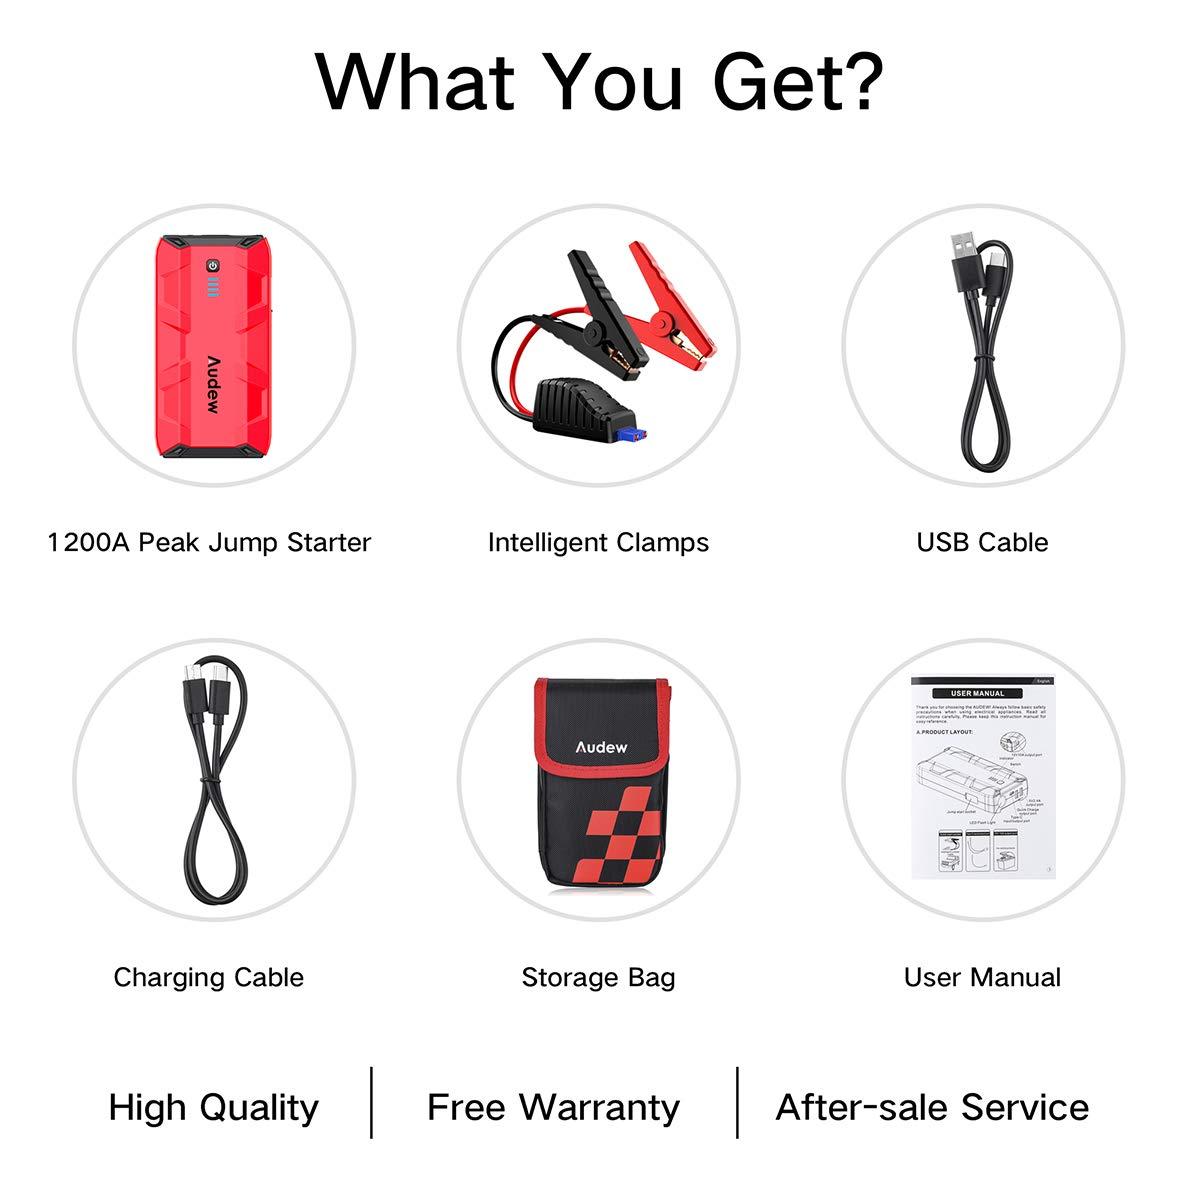 Audew Avviatore portatile per auto Jump Starter